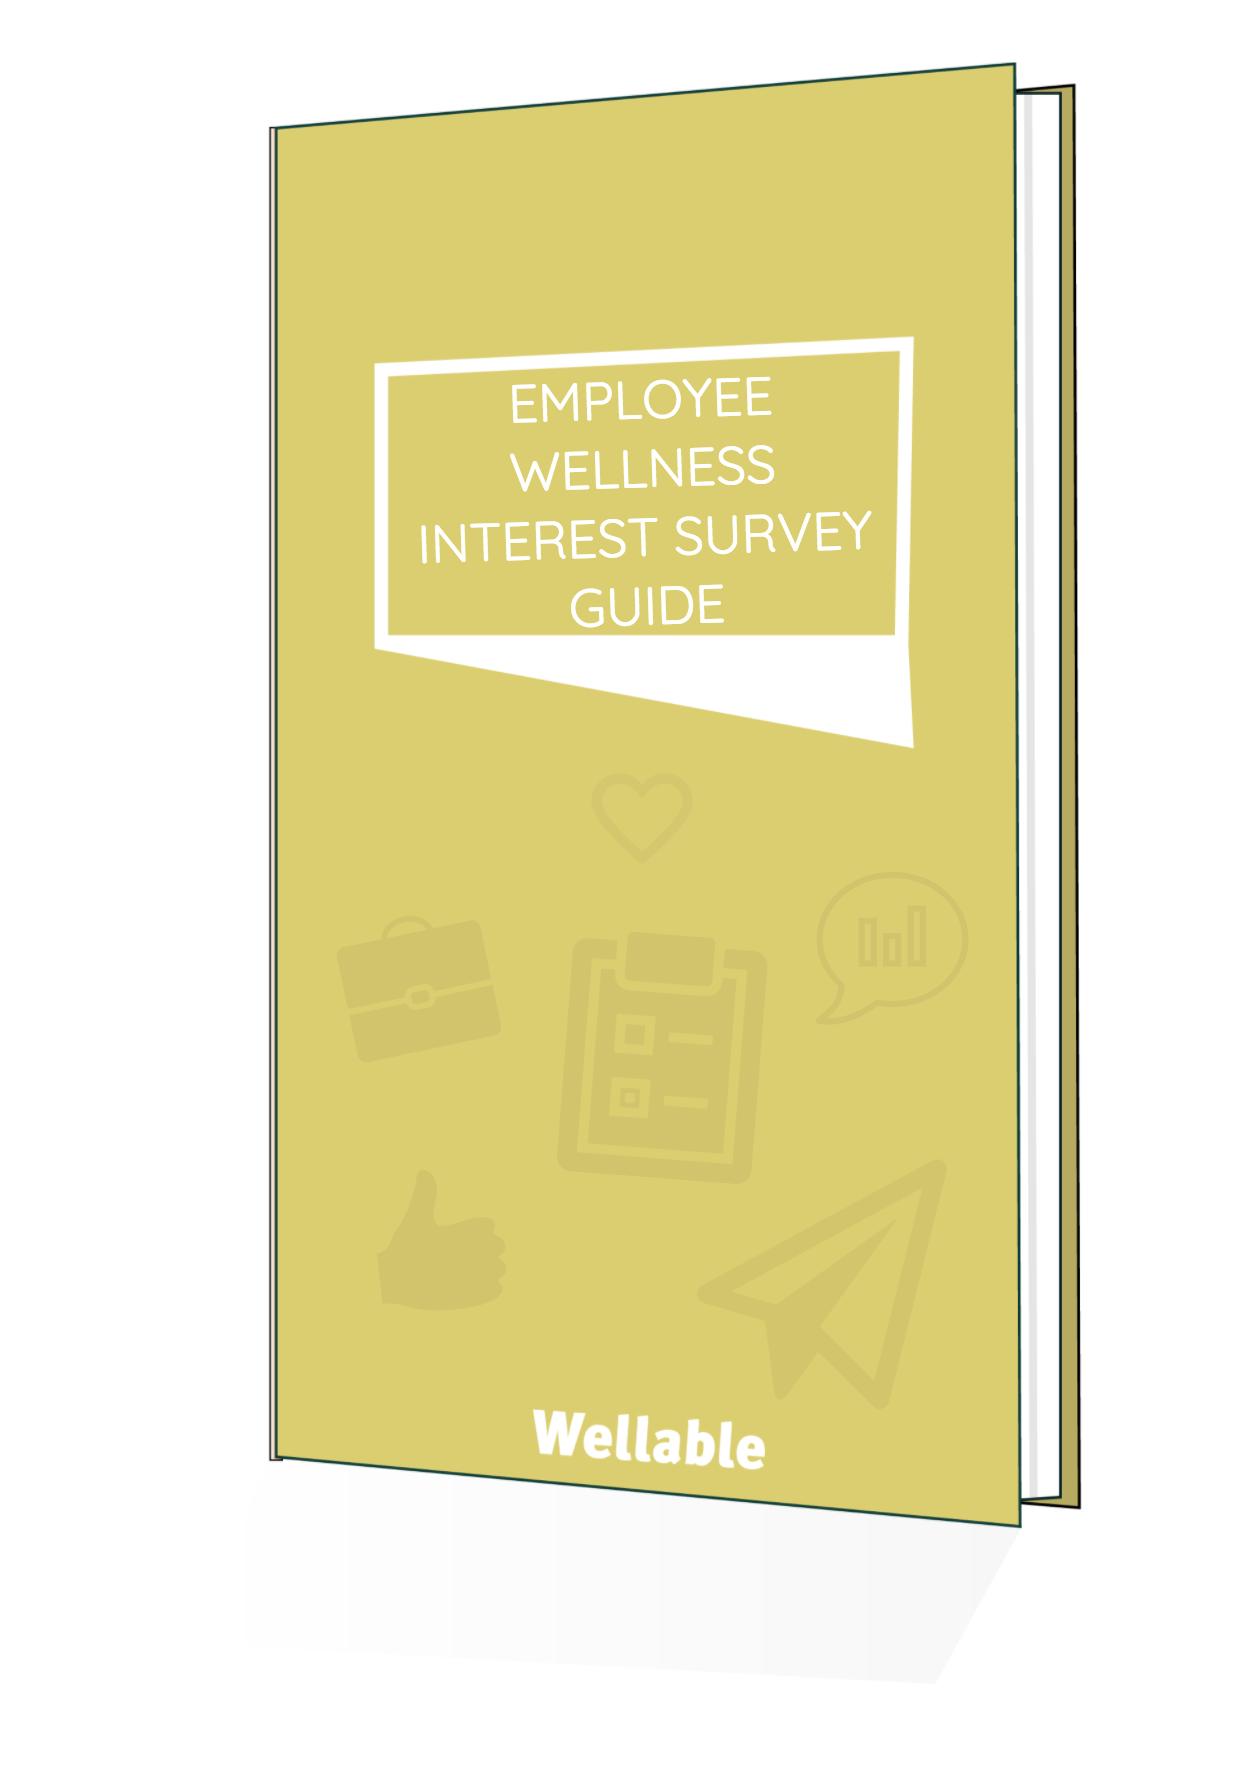 employee wellness survey template ebook cover.png